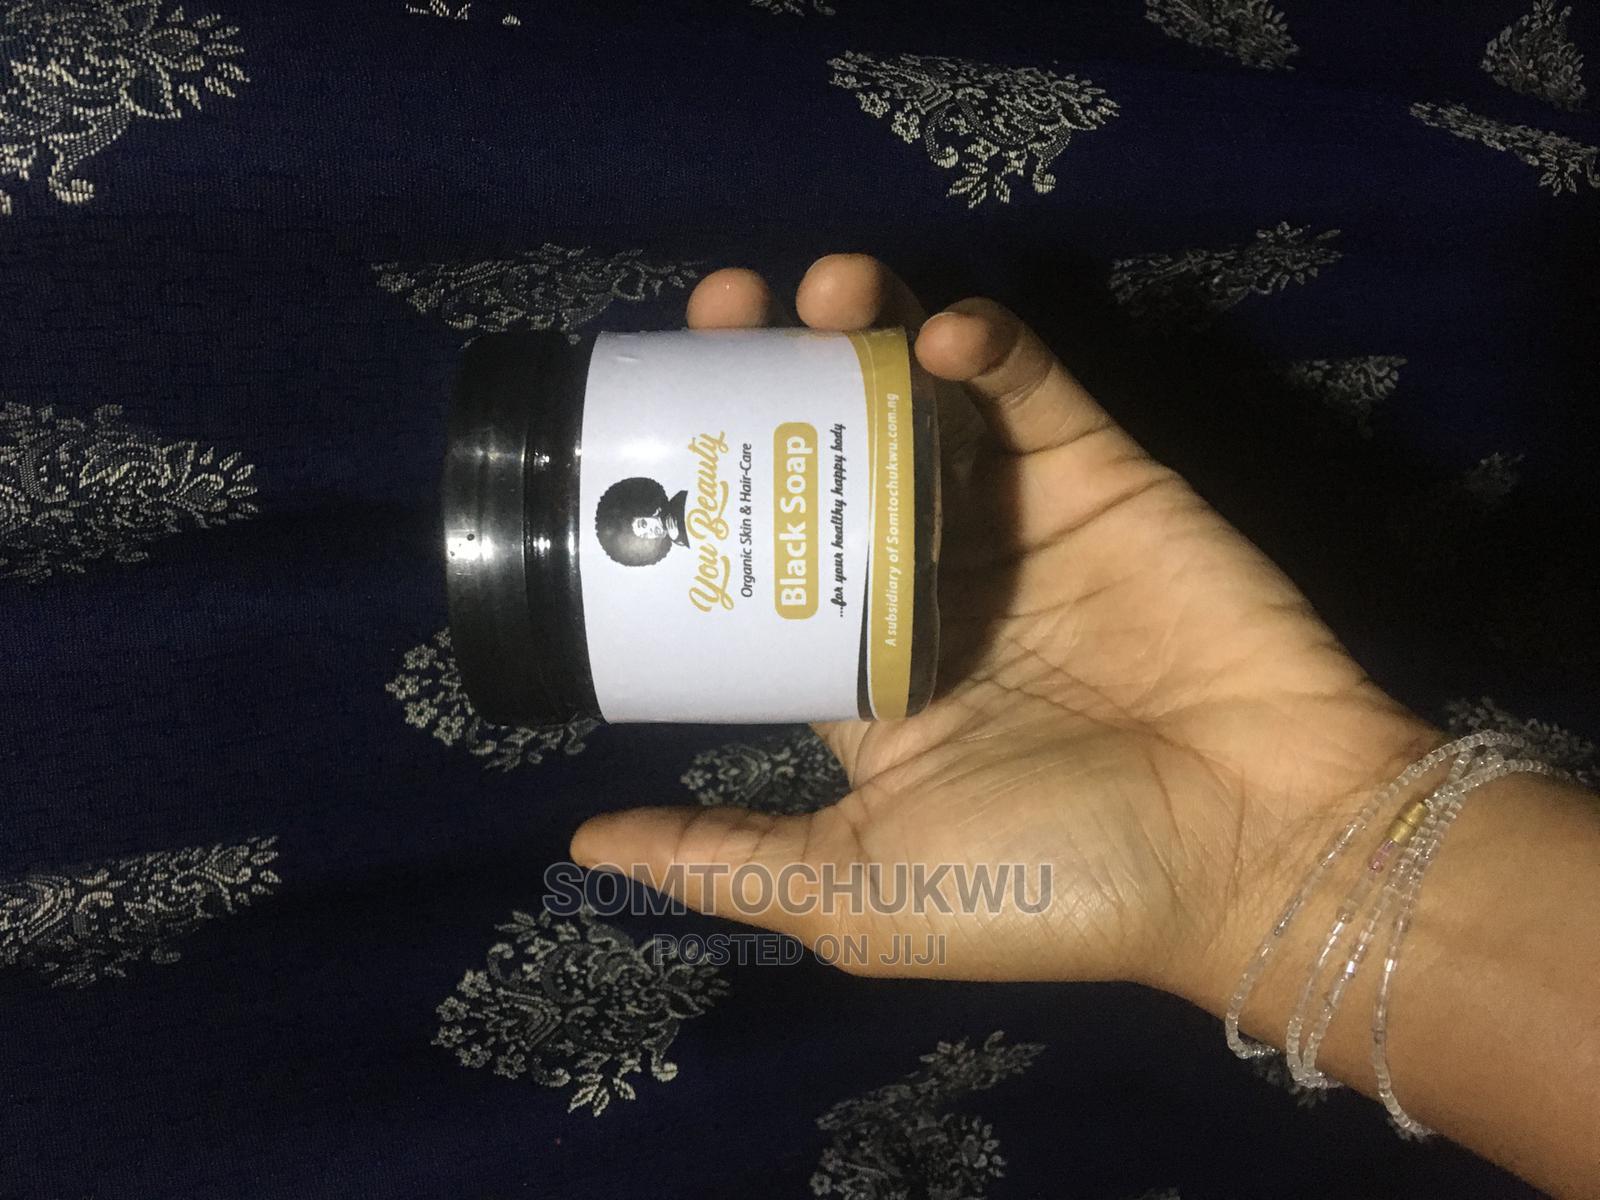 African 100% Organic Black Soap for Skin - Youbeauty Organic